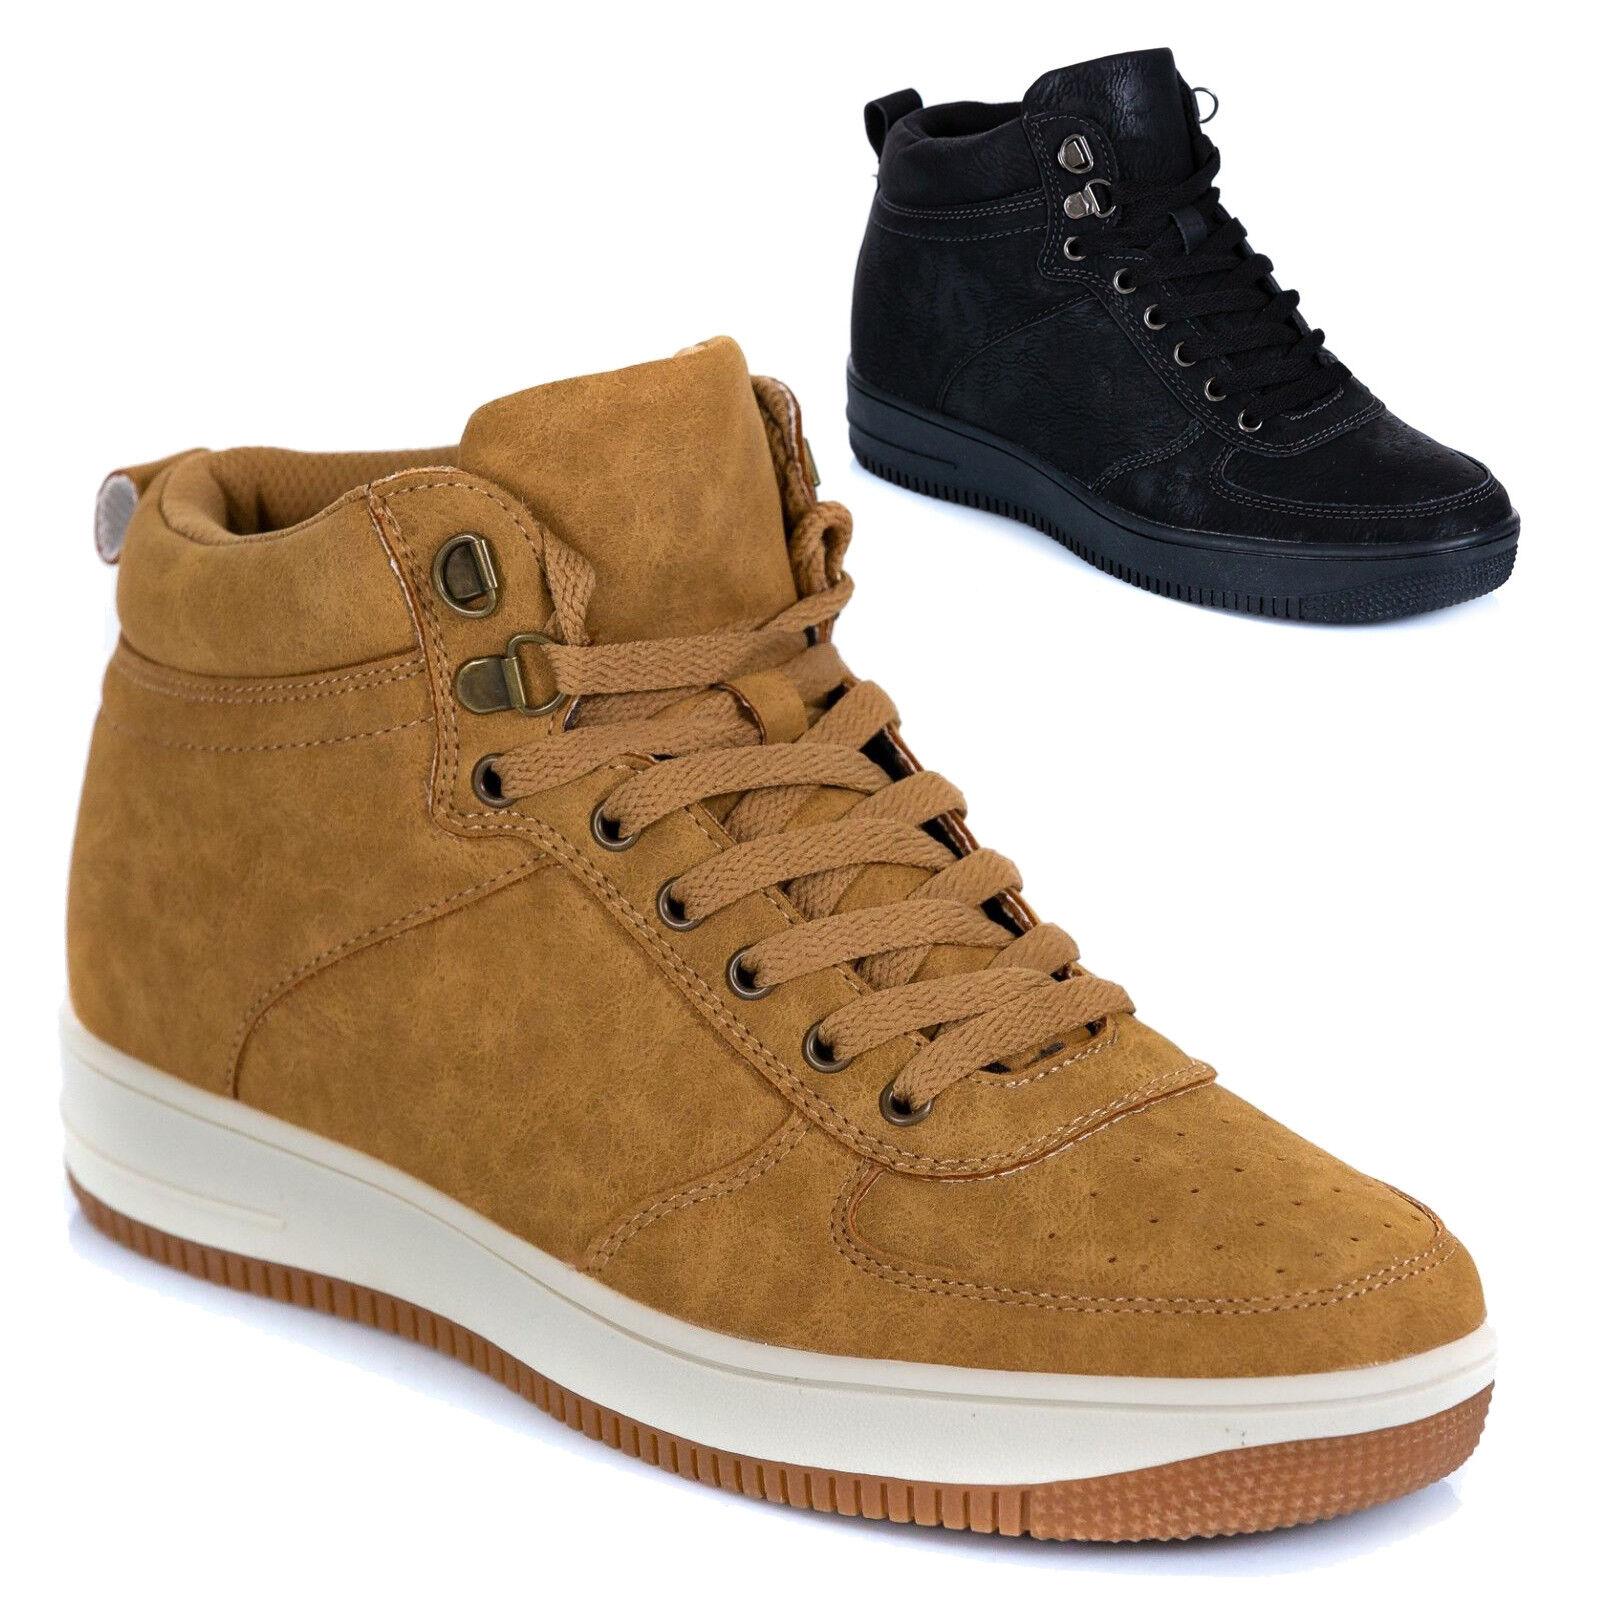 Scarponcini Stivali Stivaletti shoes men women Pelle PU Anfibi Sneakers T47-3